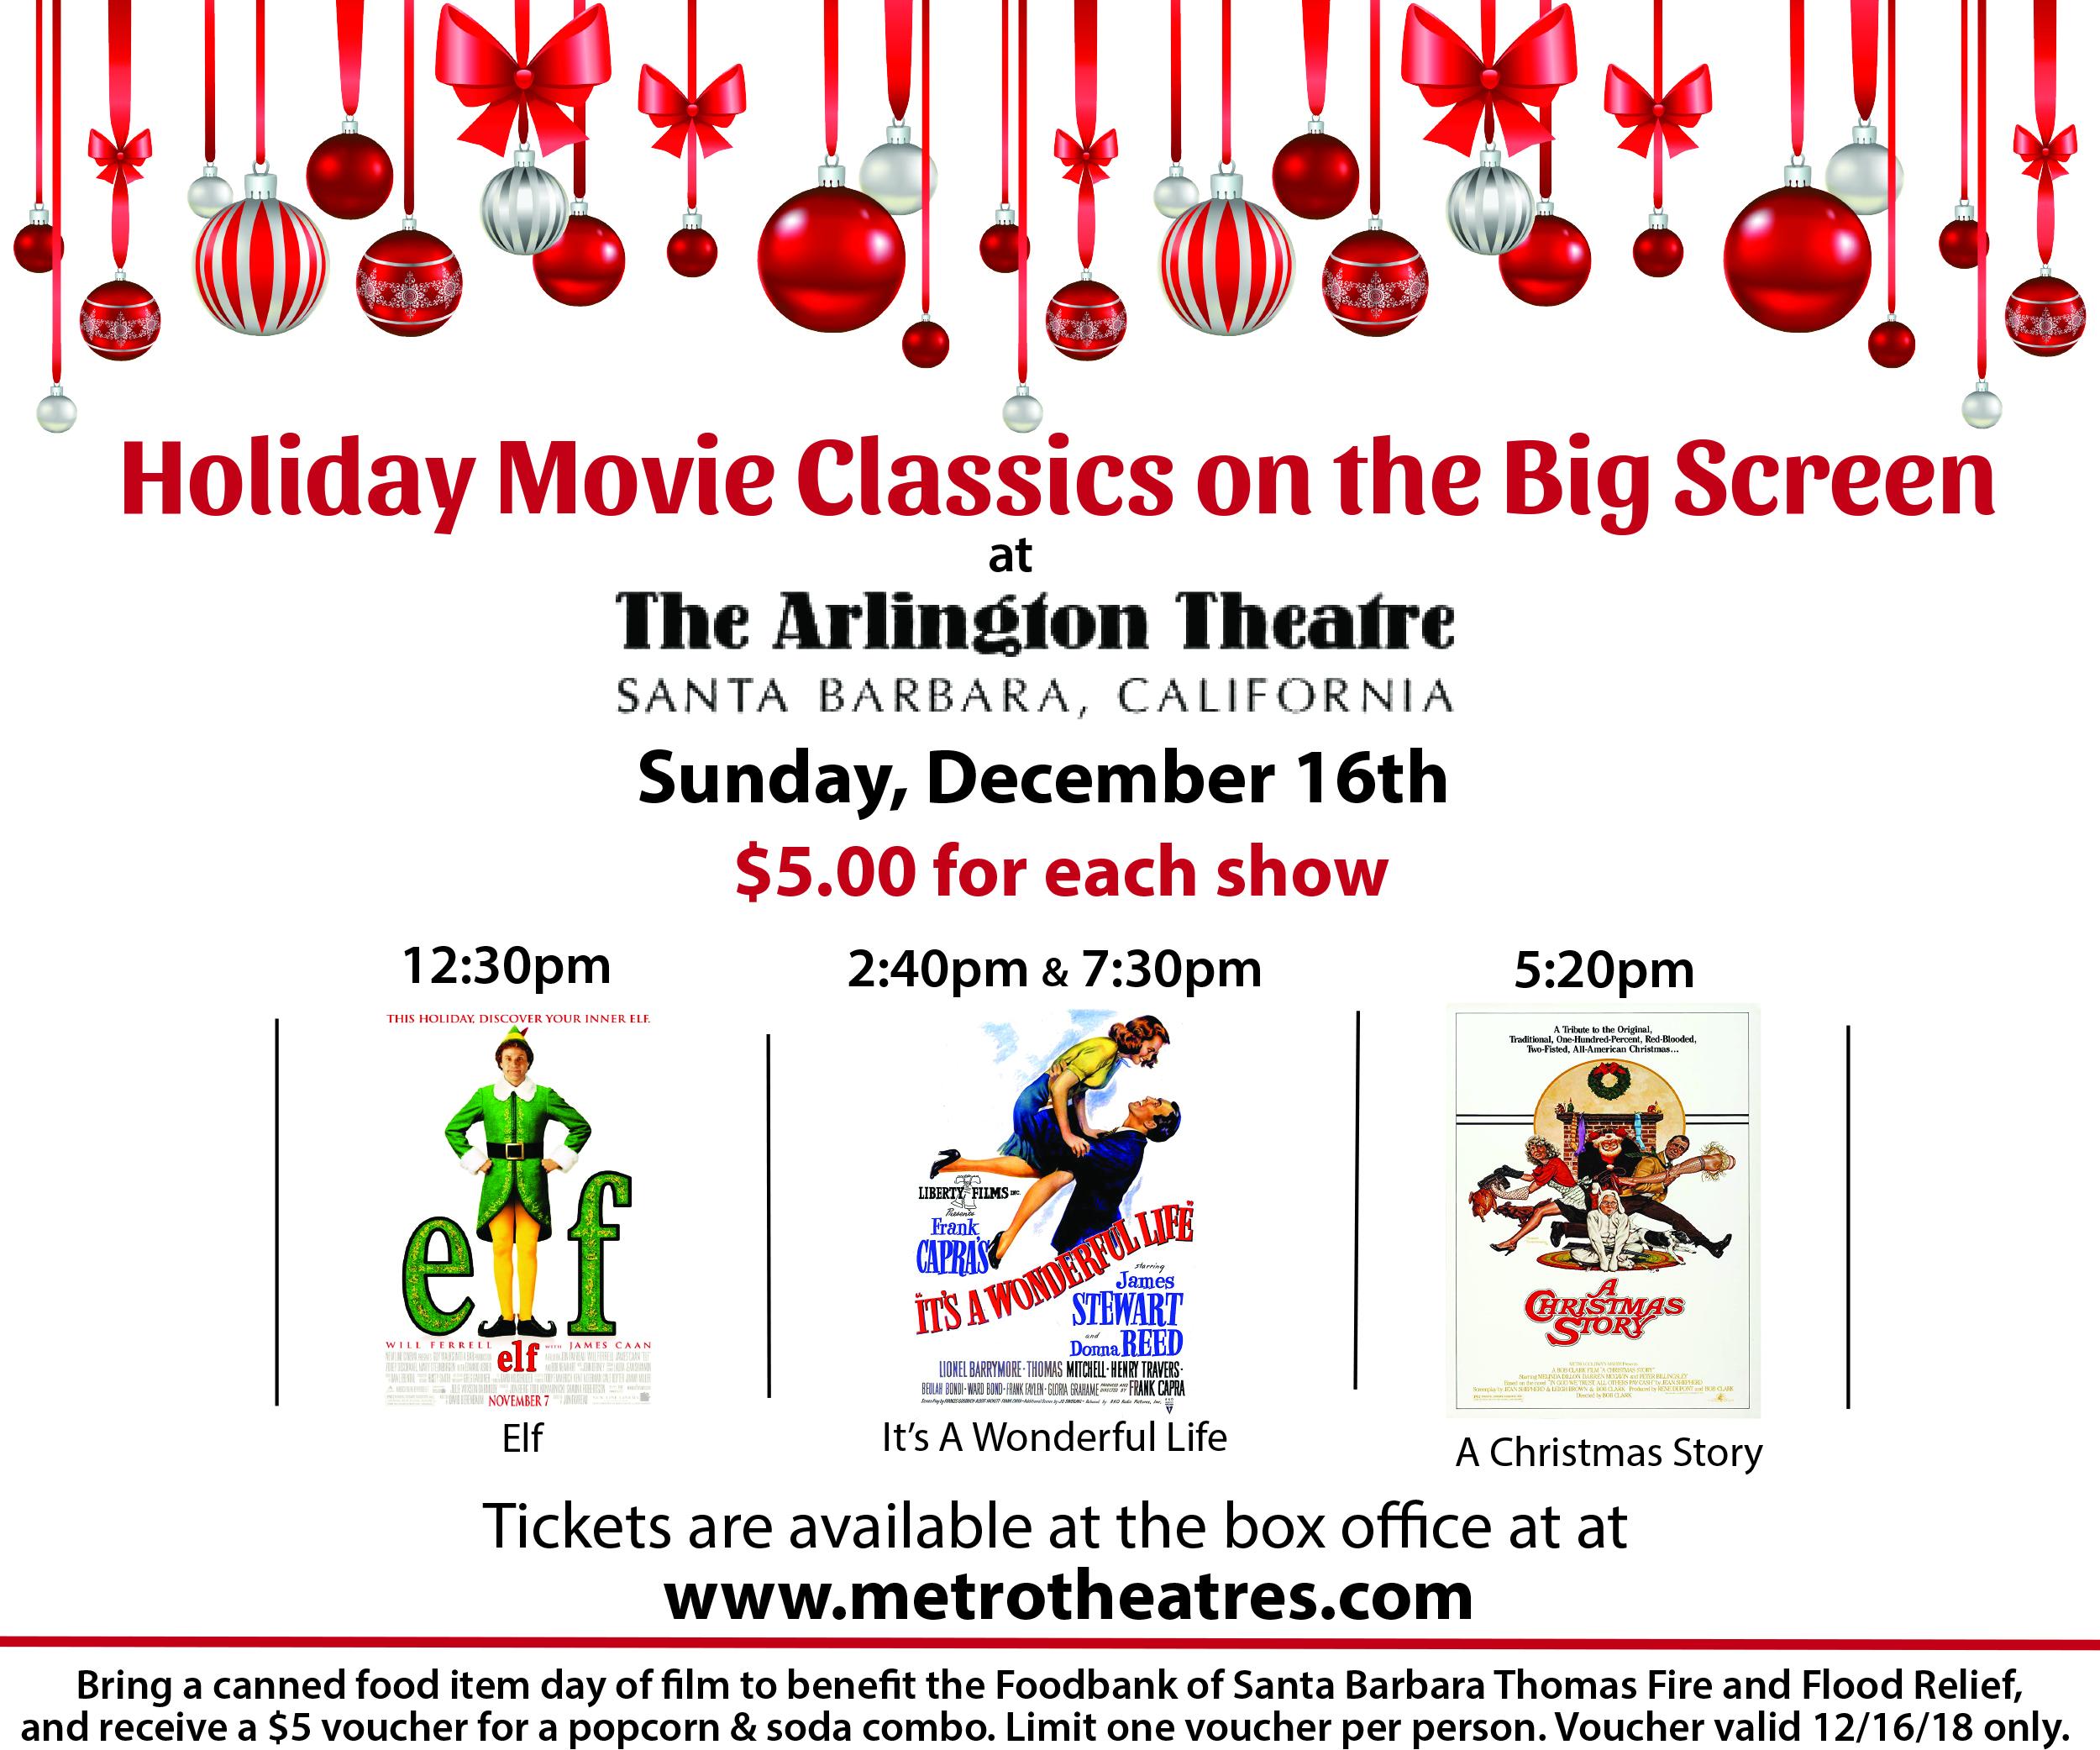 Metropolitan Theatres | Arlington Theatre